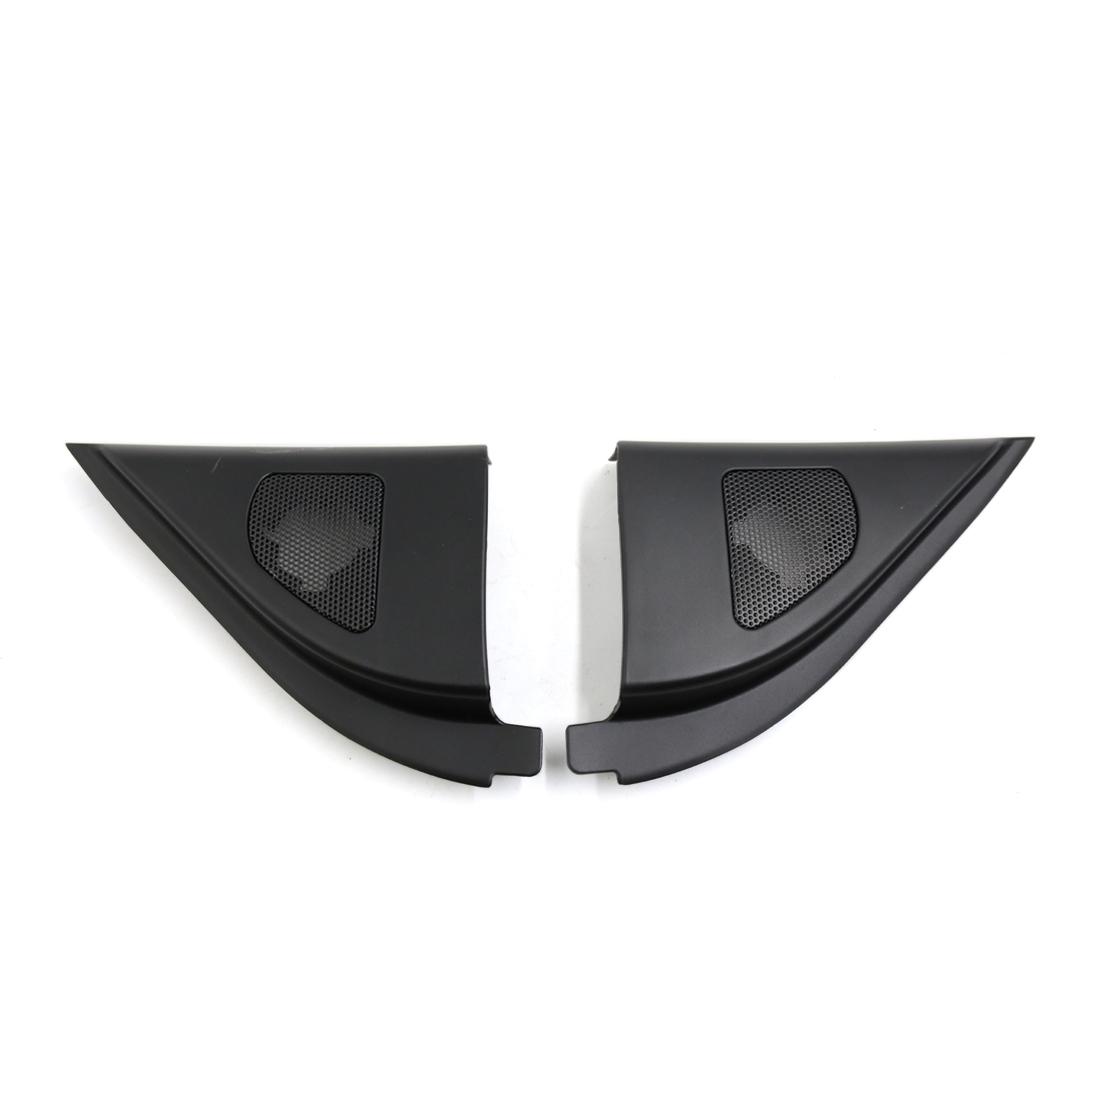 2 Pcs 6.5 x 5cm Mesh Black Car Tweeter Trumpet Dustproof Cover for Kia Forte